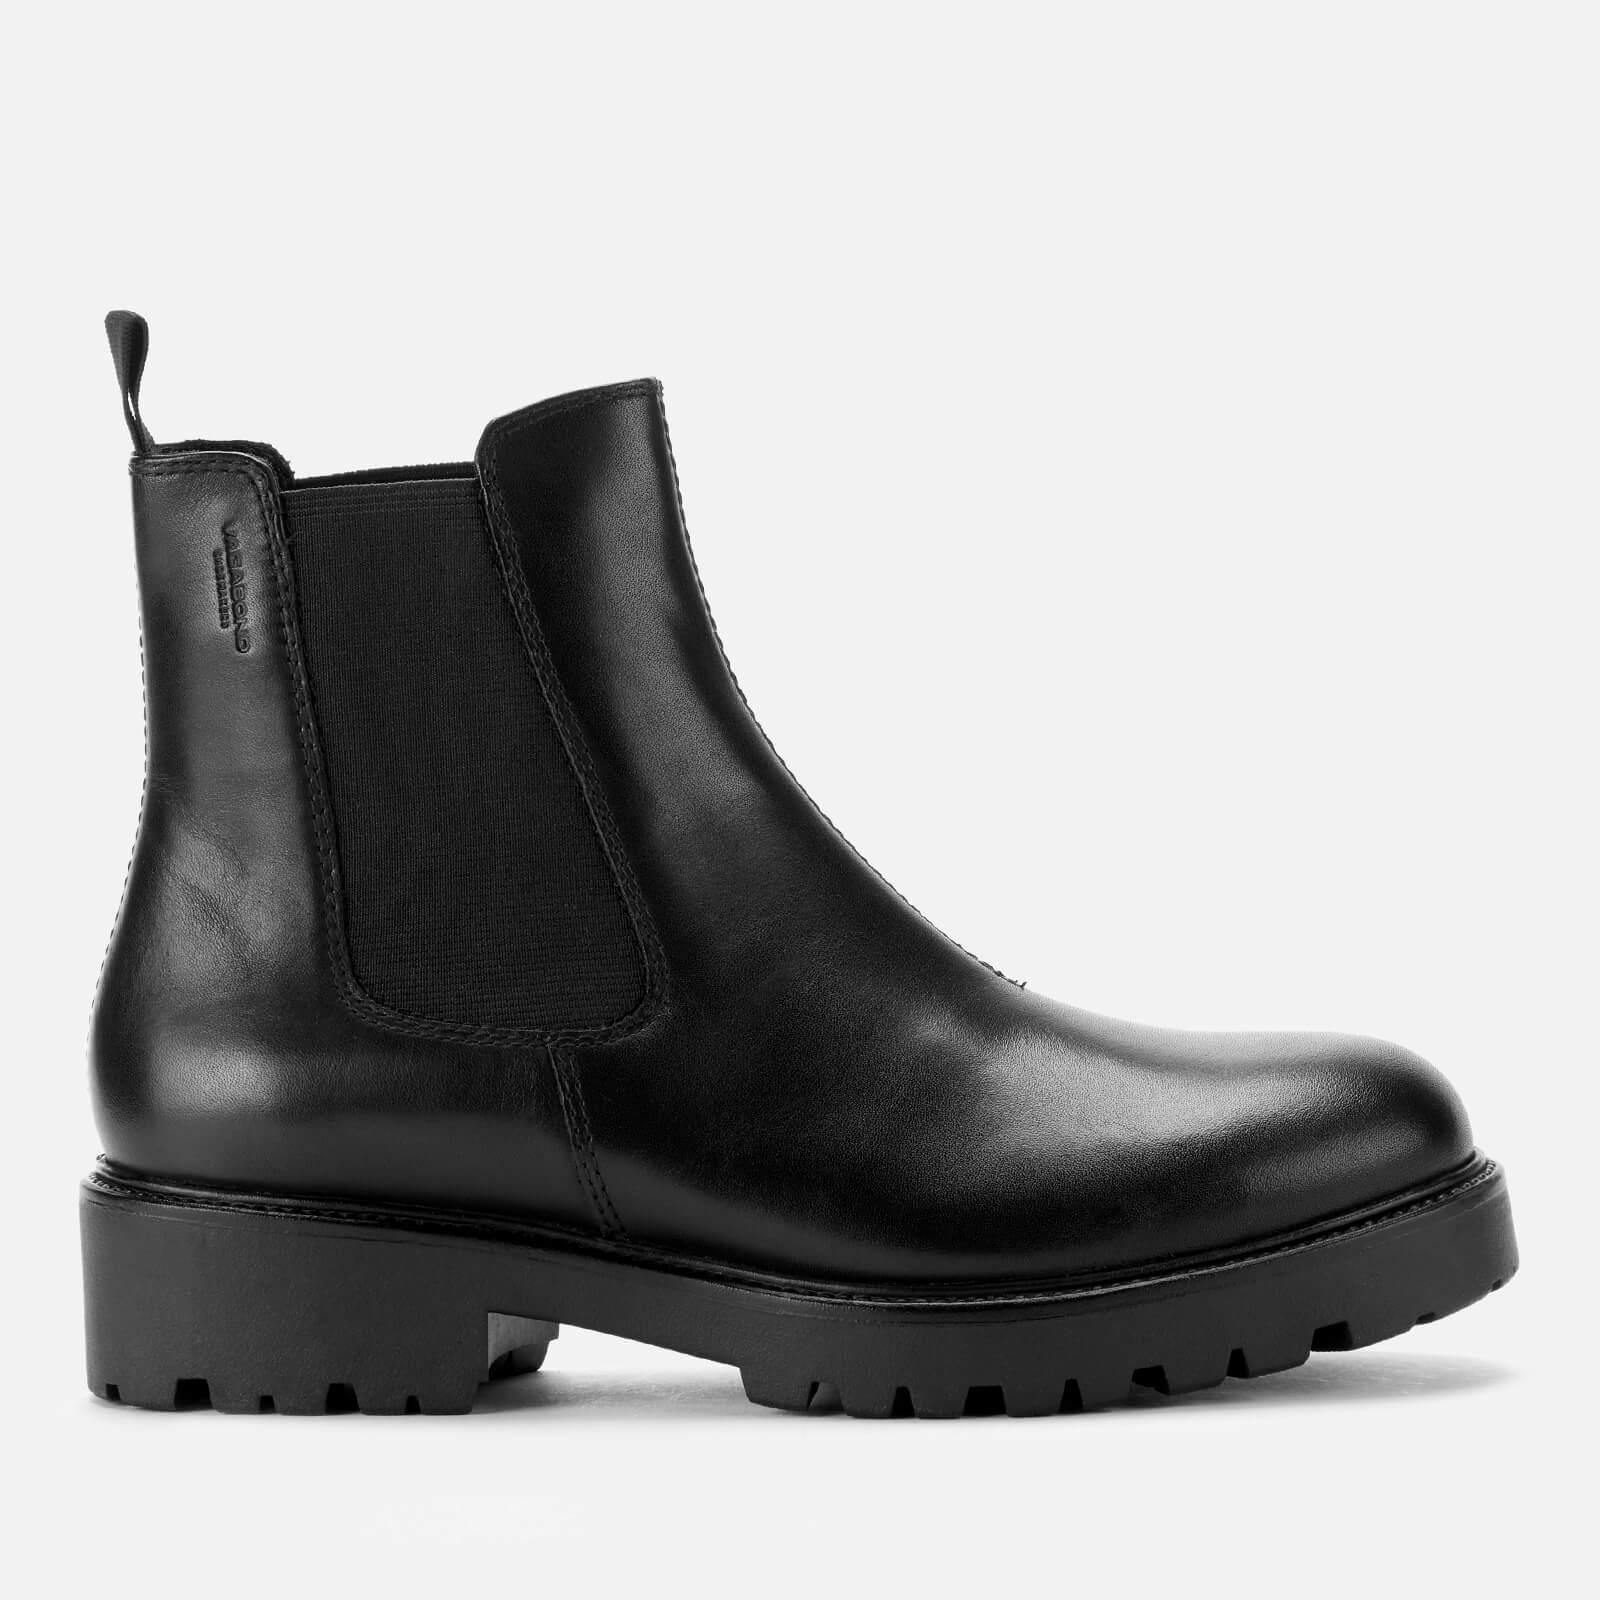 Vagabond Women's Kenova Leather Chunky Chelsea Boots - Black - Uk 3